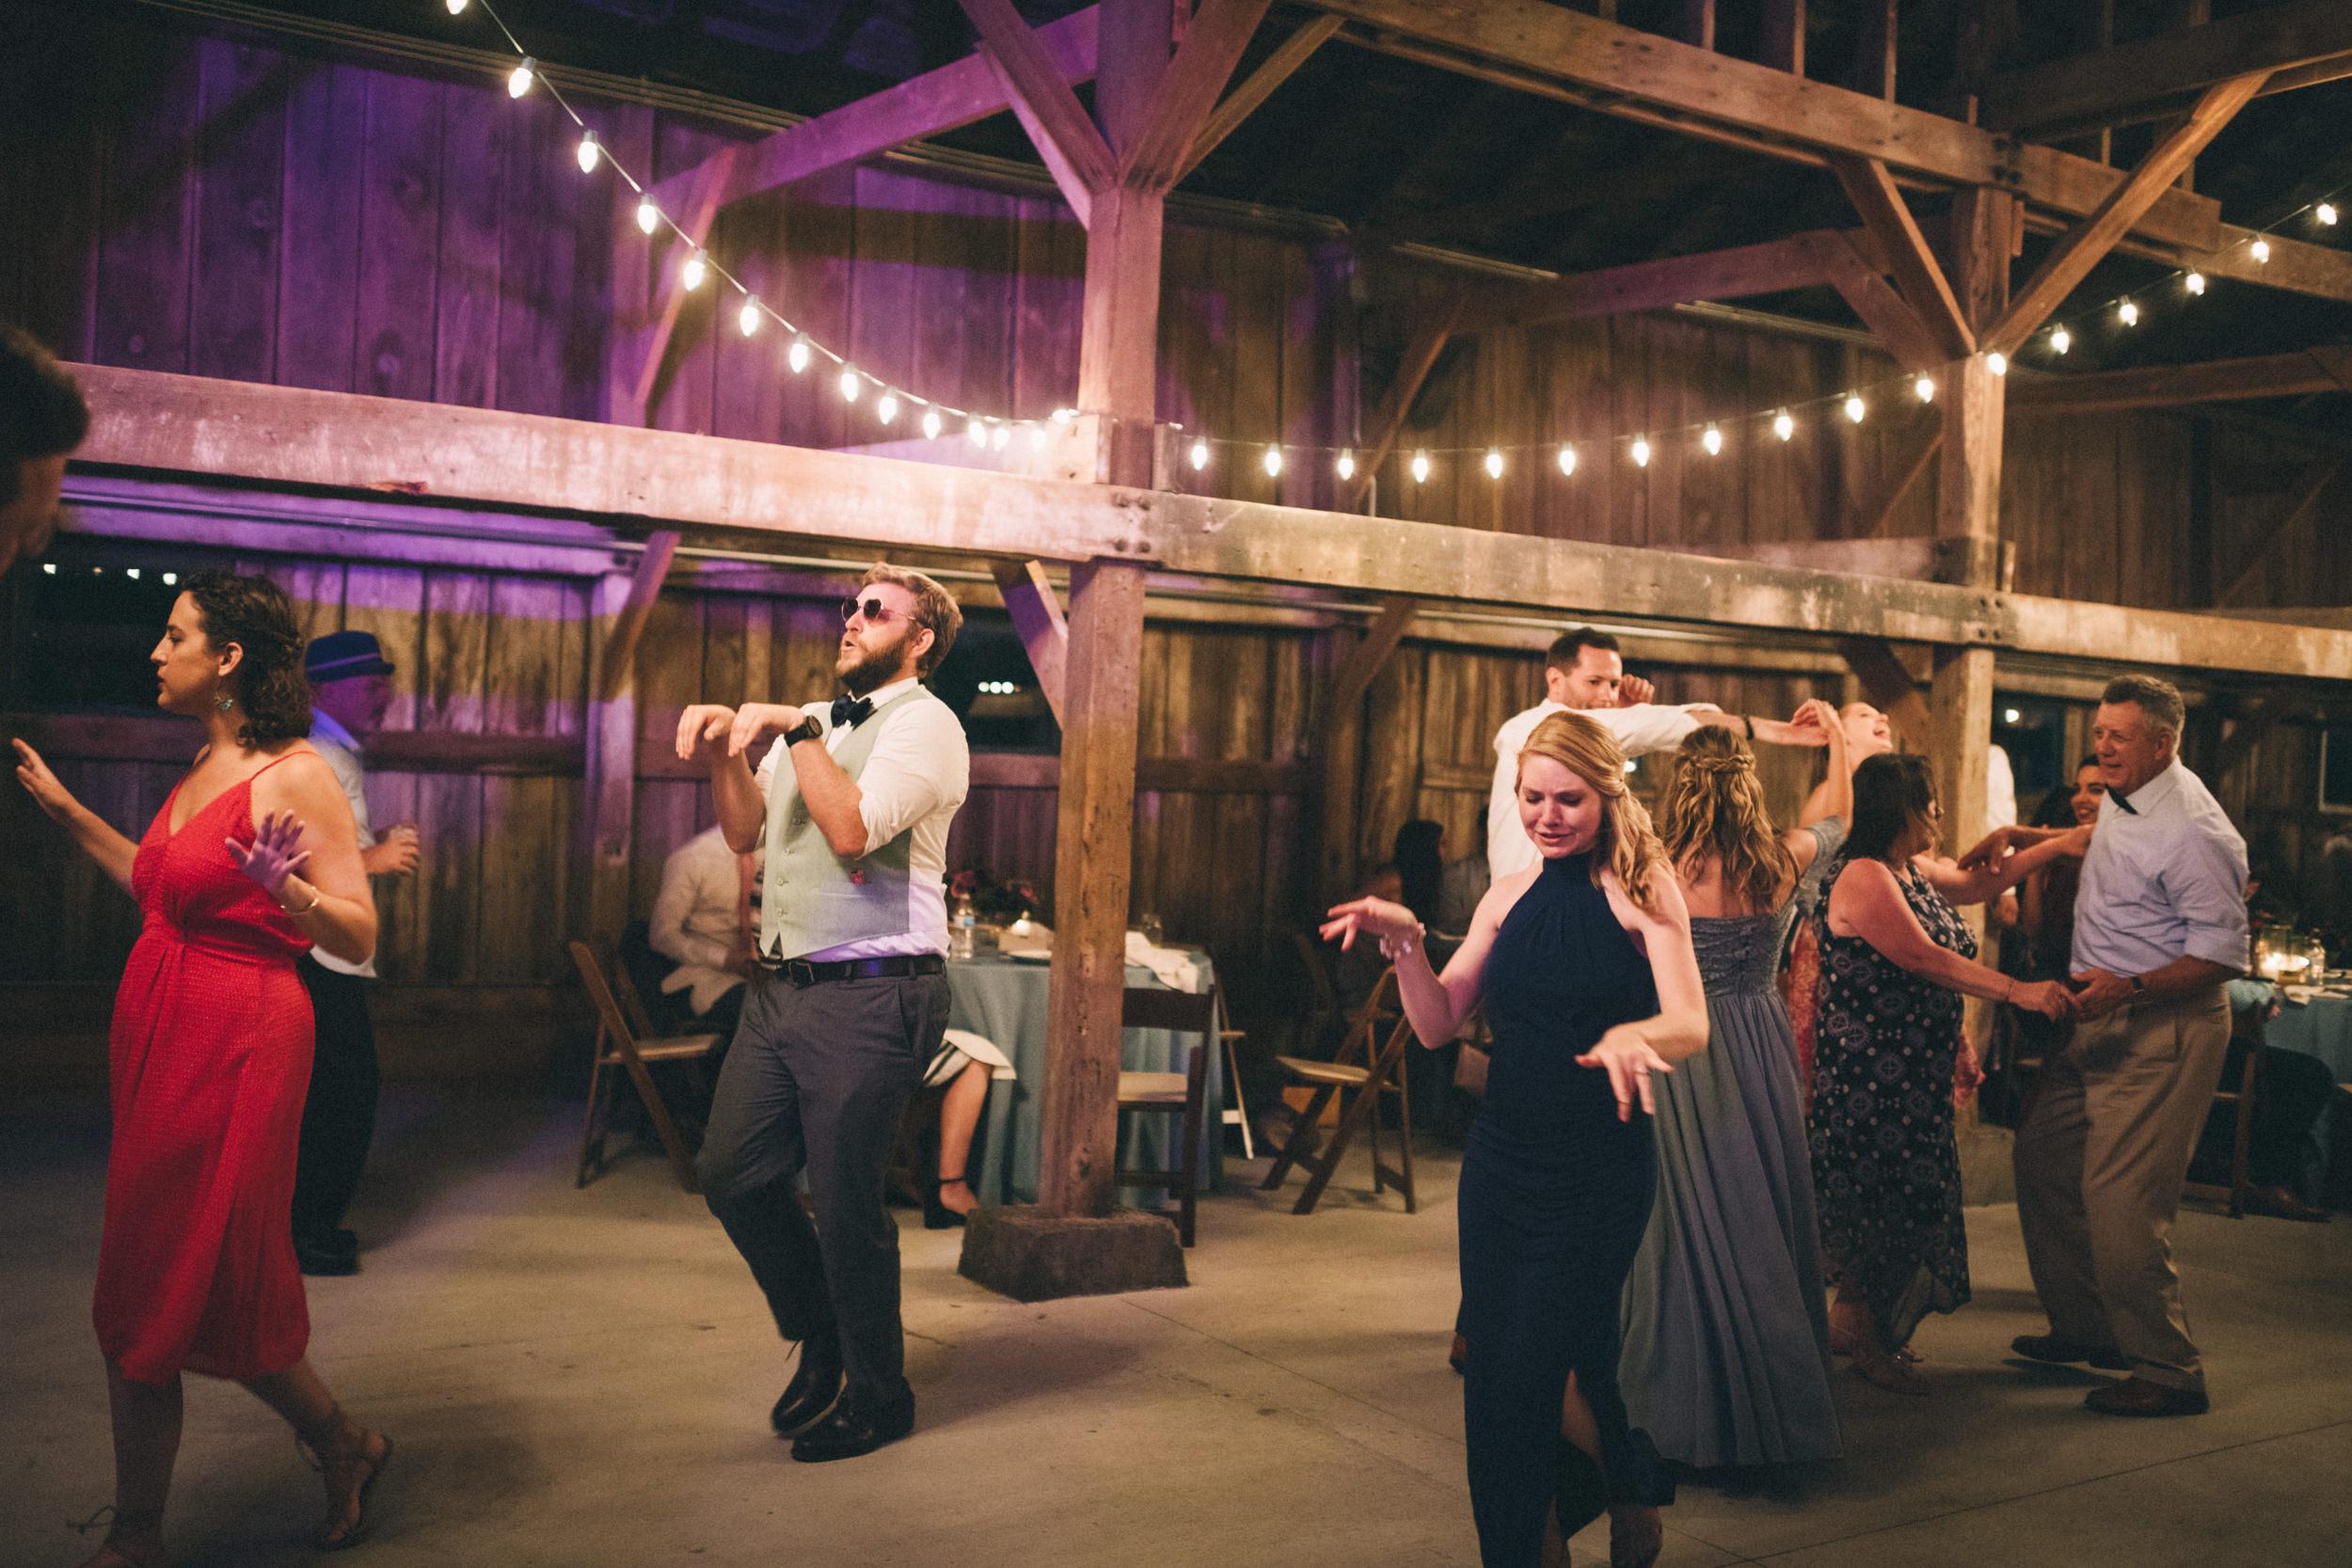 Louisville-Kentucky-Wedding-and-Elopement-Photographer-Sarah-Katherine-Davis-Photography-Summer-Jewel-Toned-Wedding-Chineese-Tea-Ceremony-Warrenwood-Manor-Danville-961.jpg